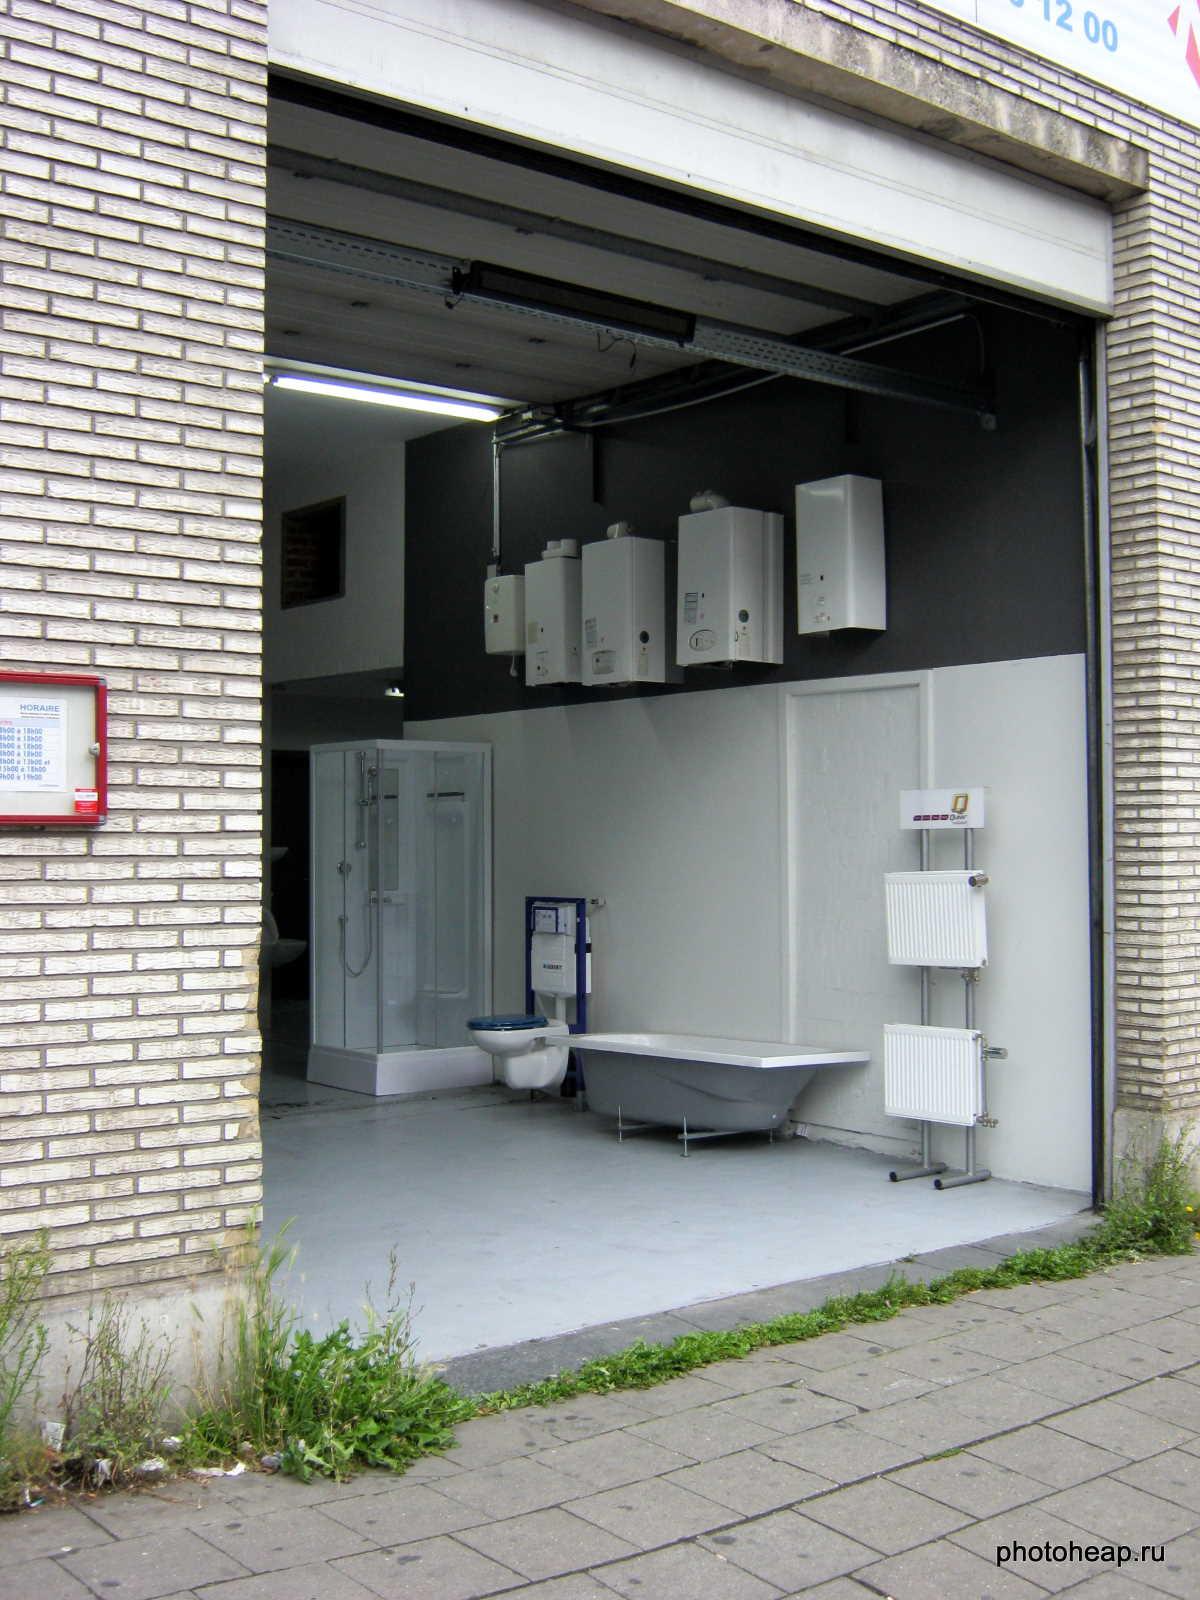 Brussels - garage shop